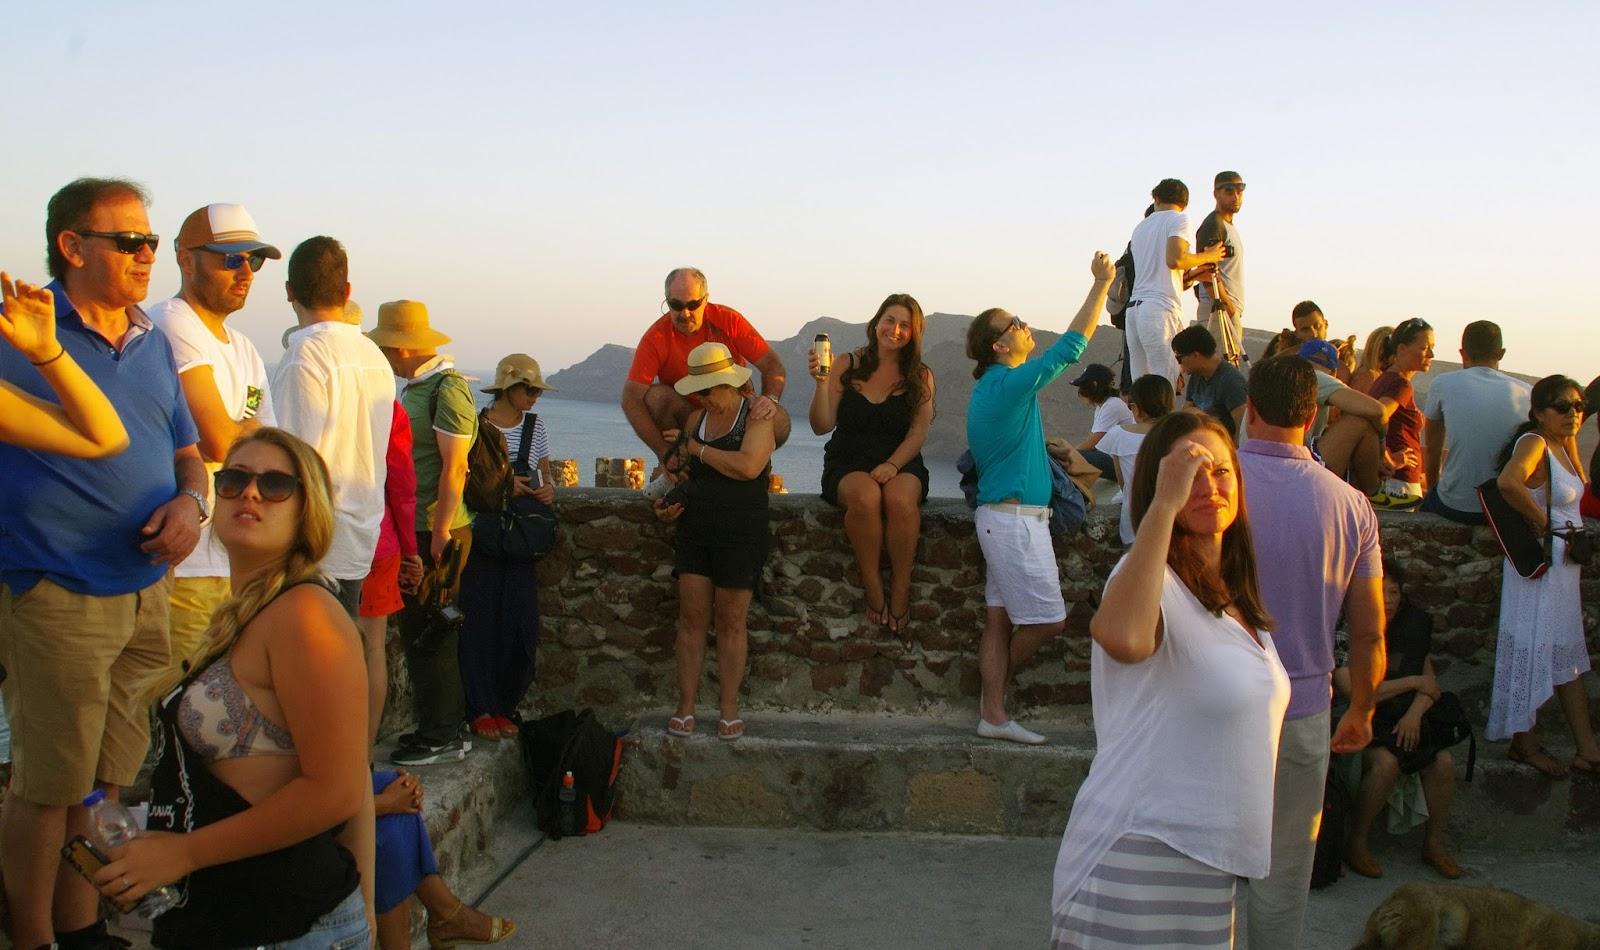 Crowds at Oia Sunset Santorini